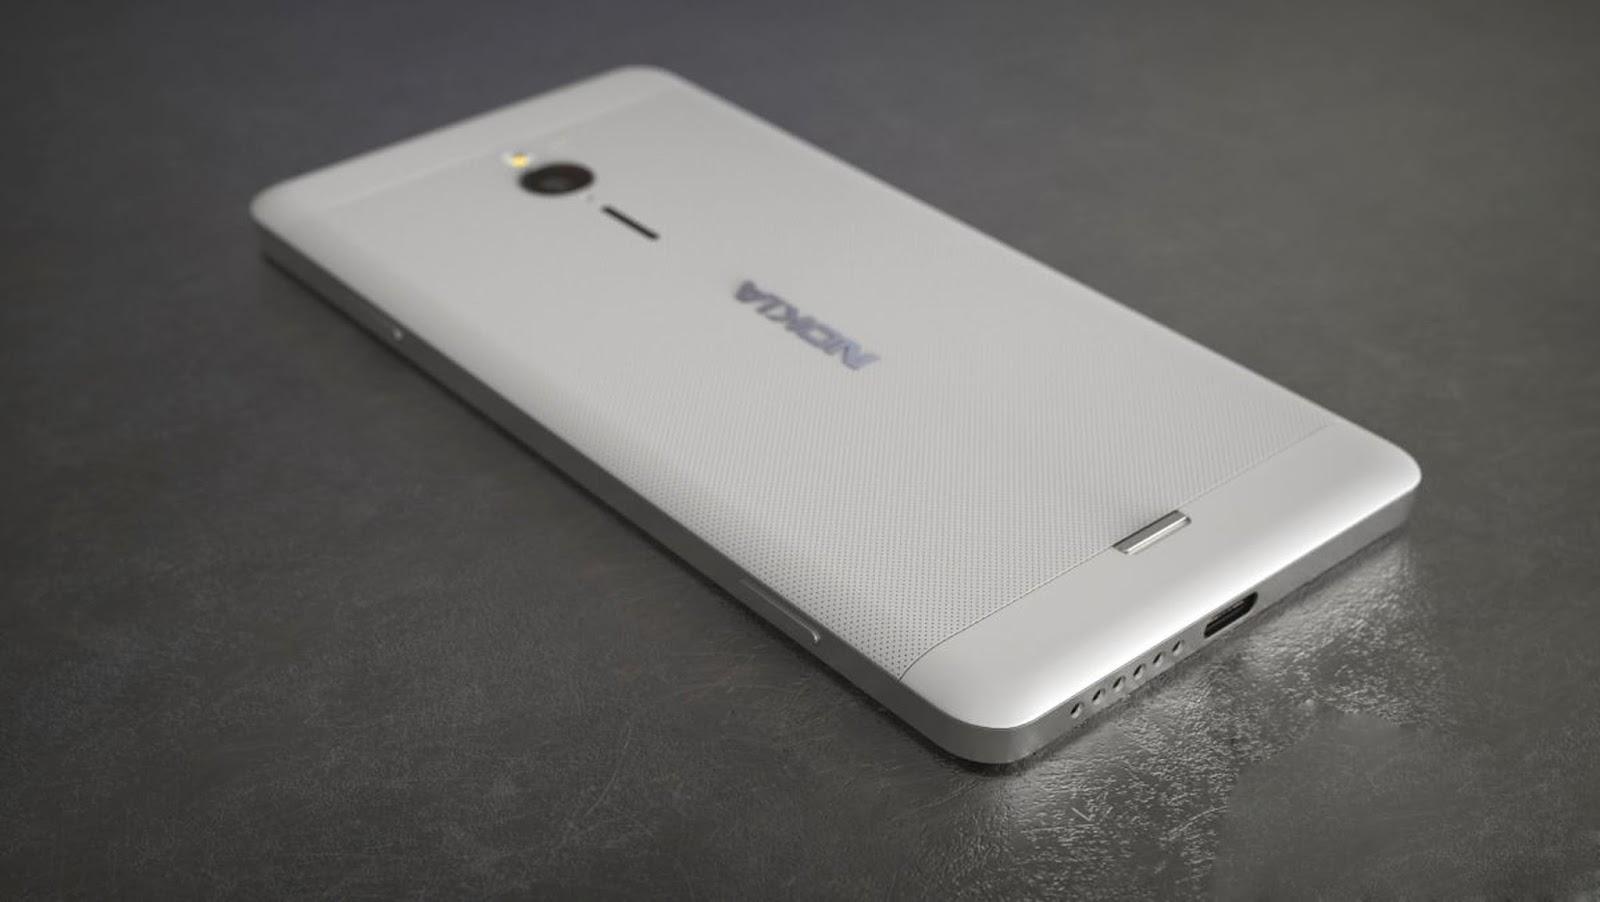 Qualcomm's Snapdragon 430 processor, Nokia D1C, Microsoft, Apple, Samsung, Nokia, smartphone industry,